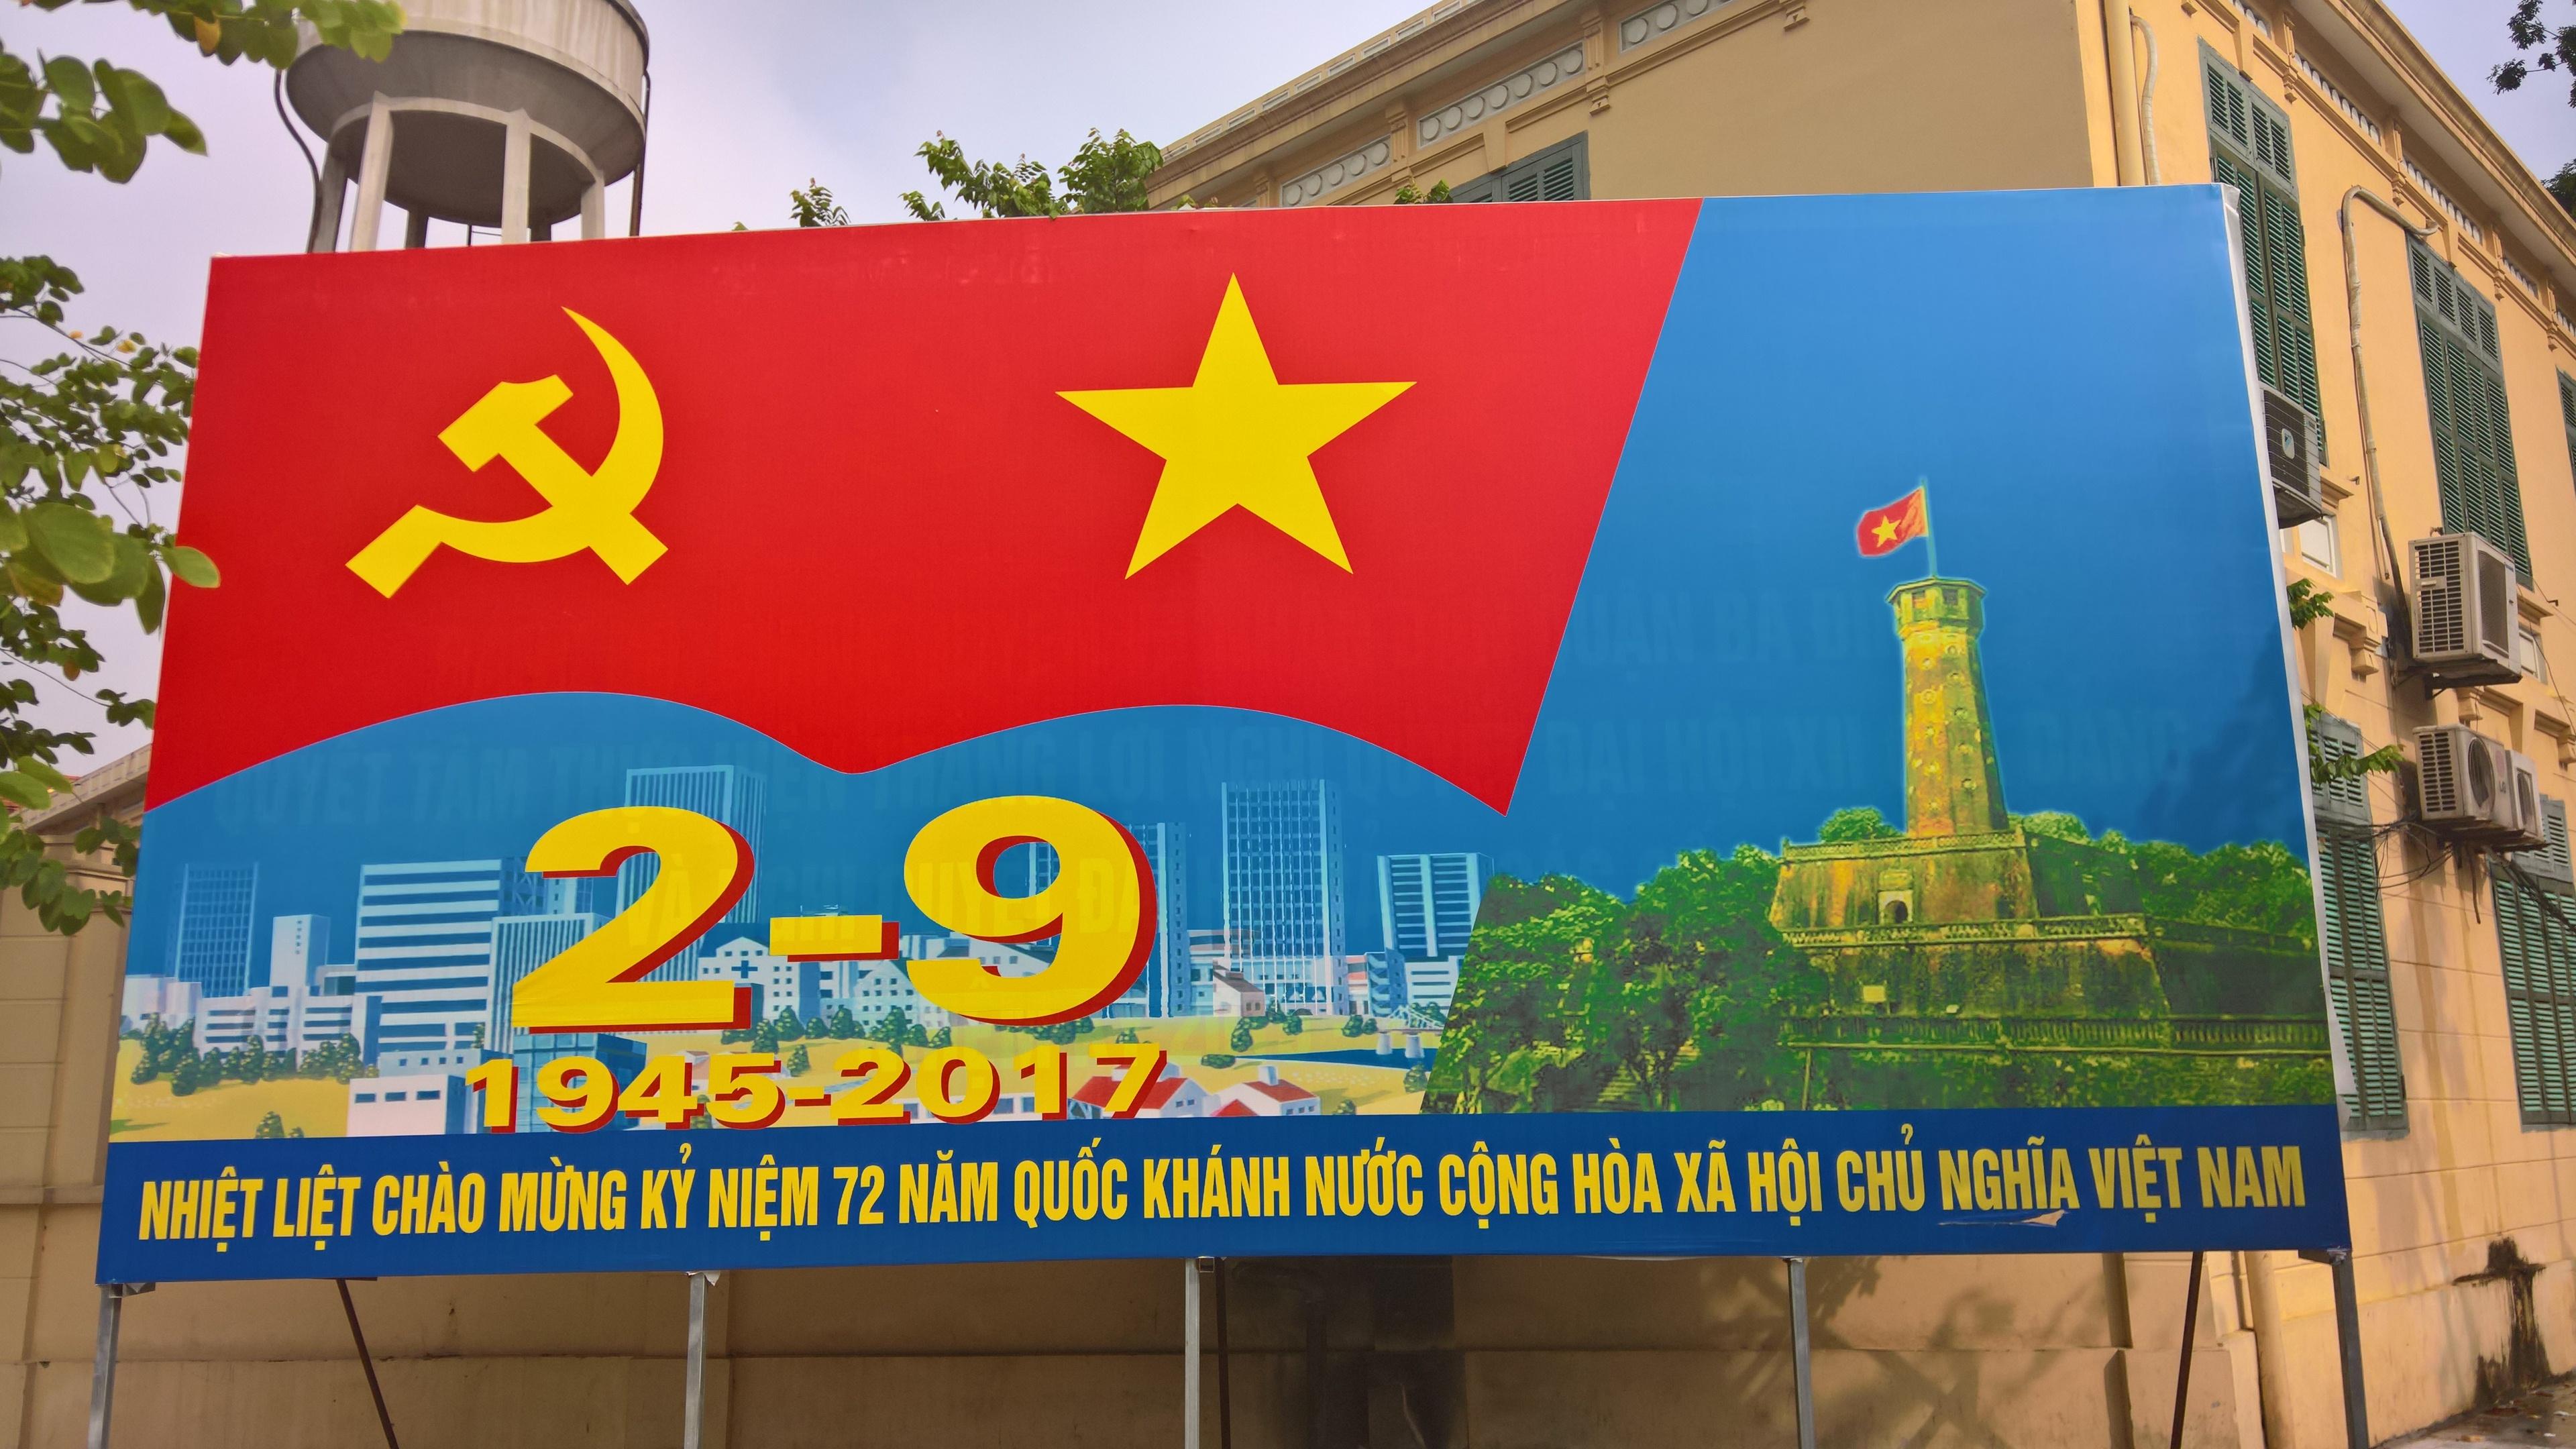 Propaganda Banners Kiddie Banners